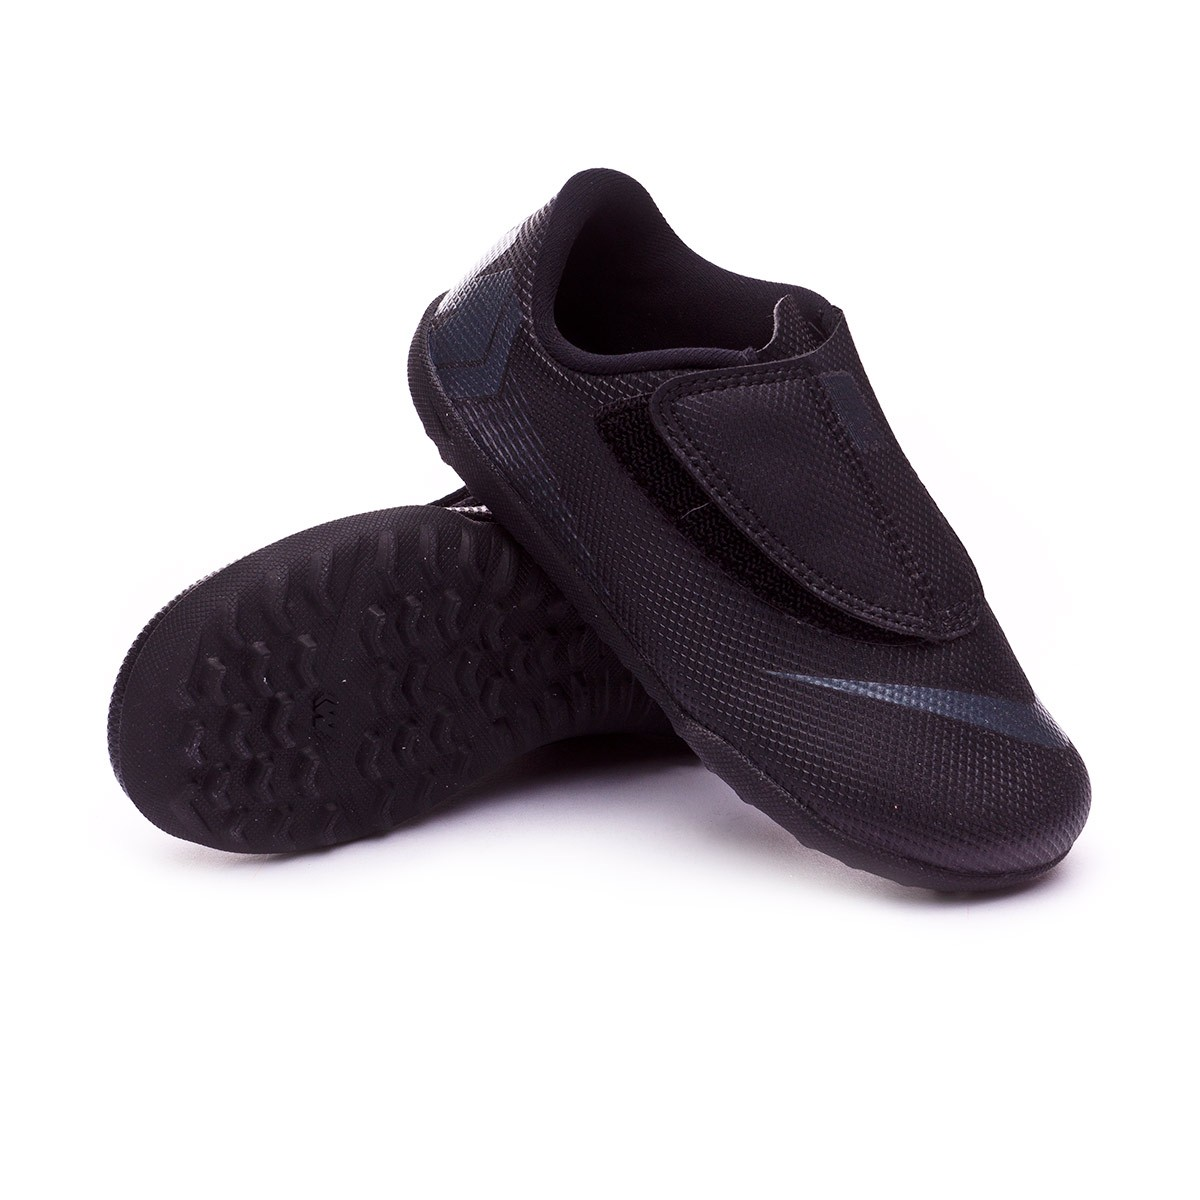 zapatillas nike niño velcro, En venta zapatos nike mercurial